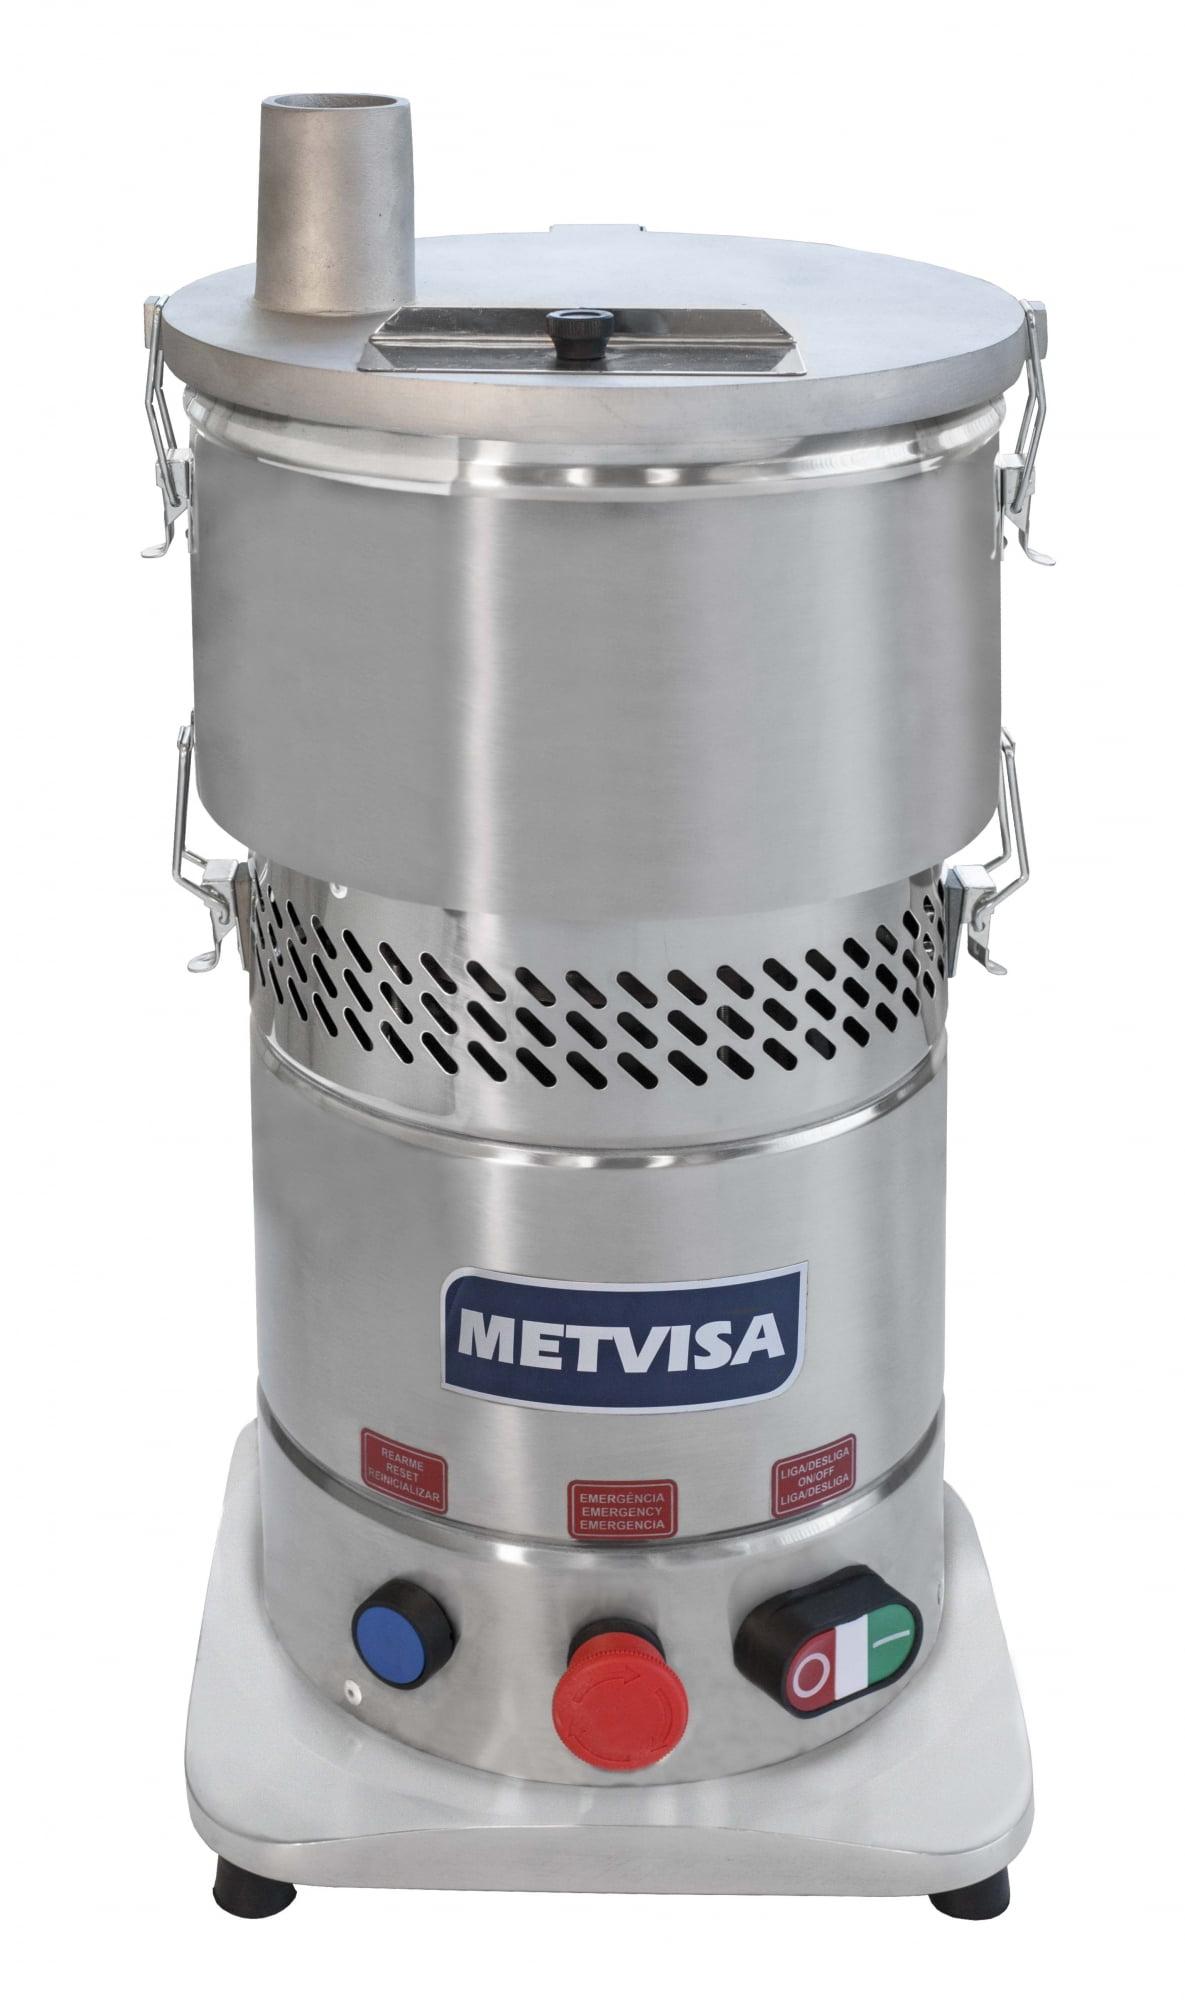 CUTTER 8L MAX - METVISA - CUT.8 MAX